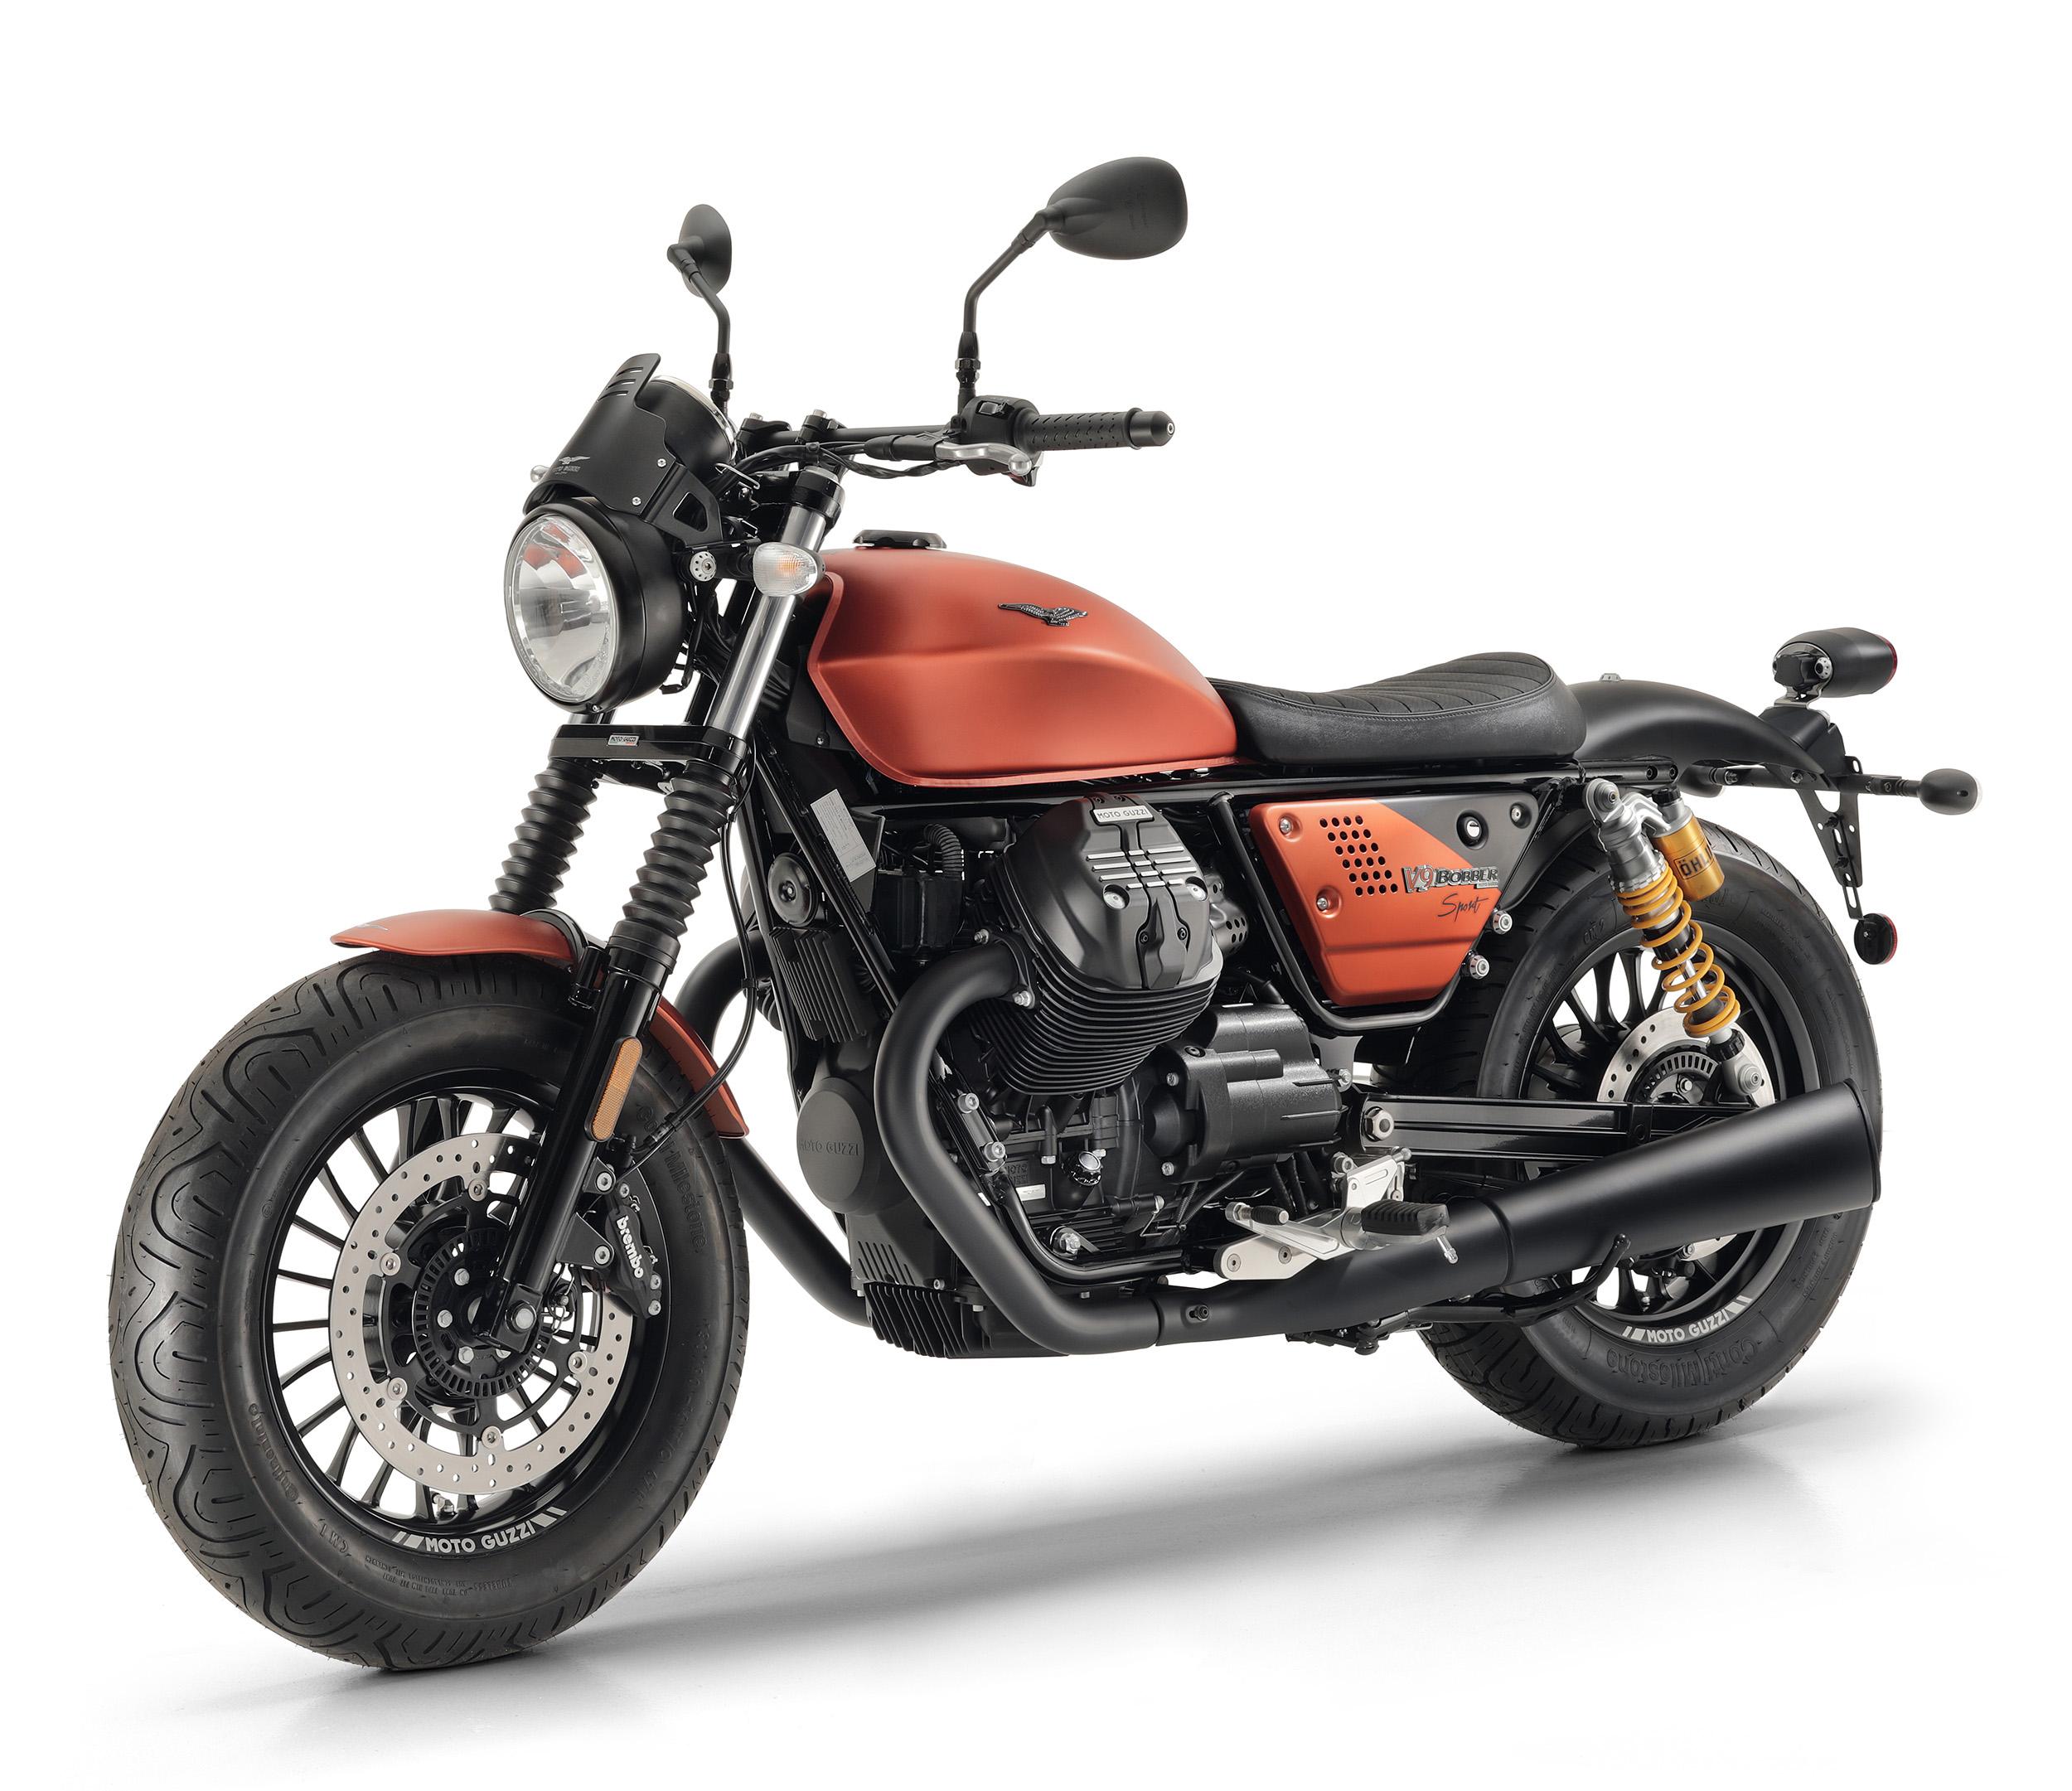 Moto Guzzi launches awesome new Bobber